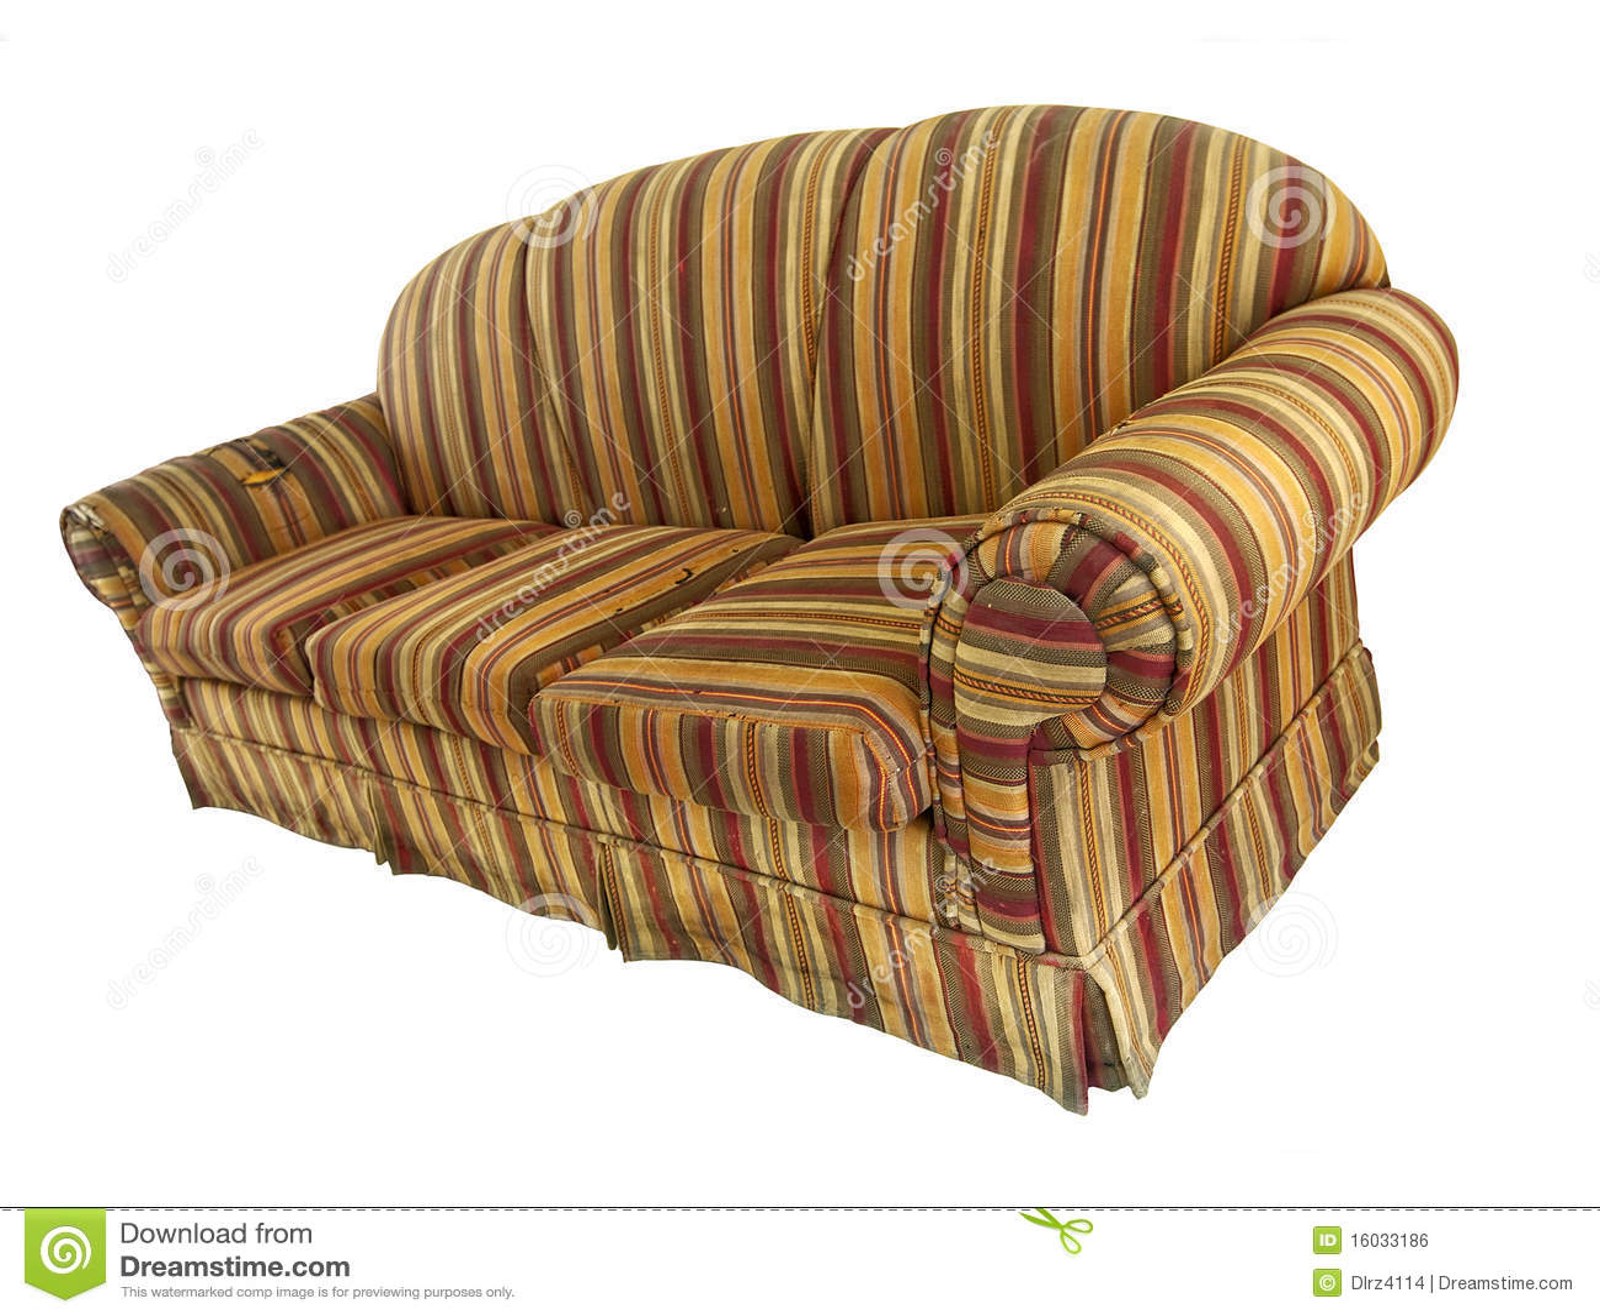 altes sofa weitwinkel lizenzfreies stockbild bild 16033186. Black Bedroom Furniture Sets. Home Design Ideas